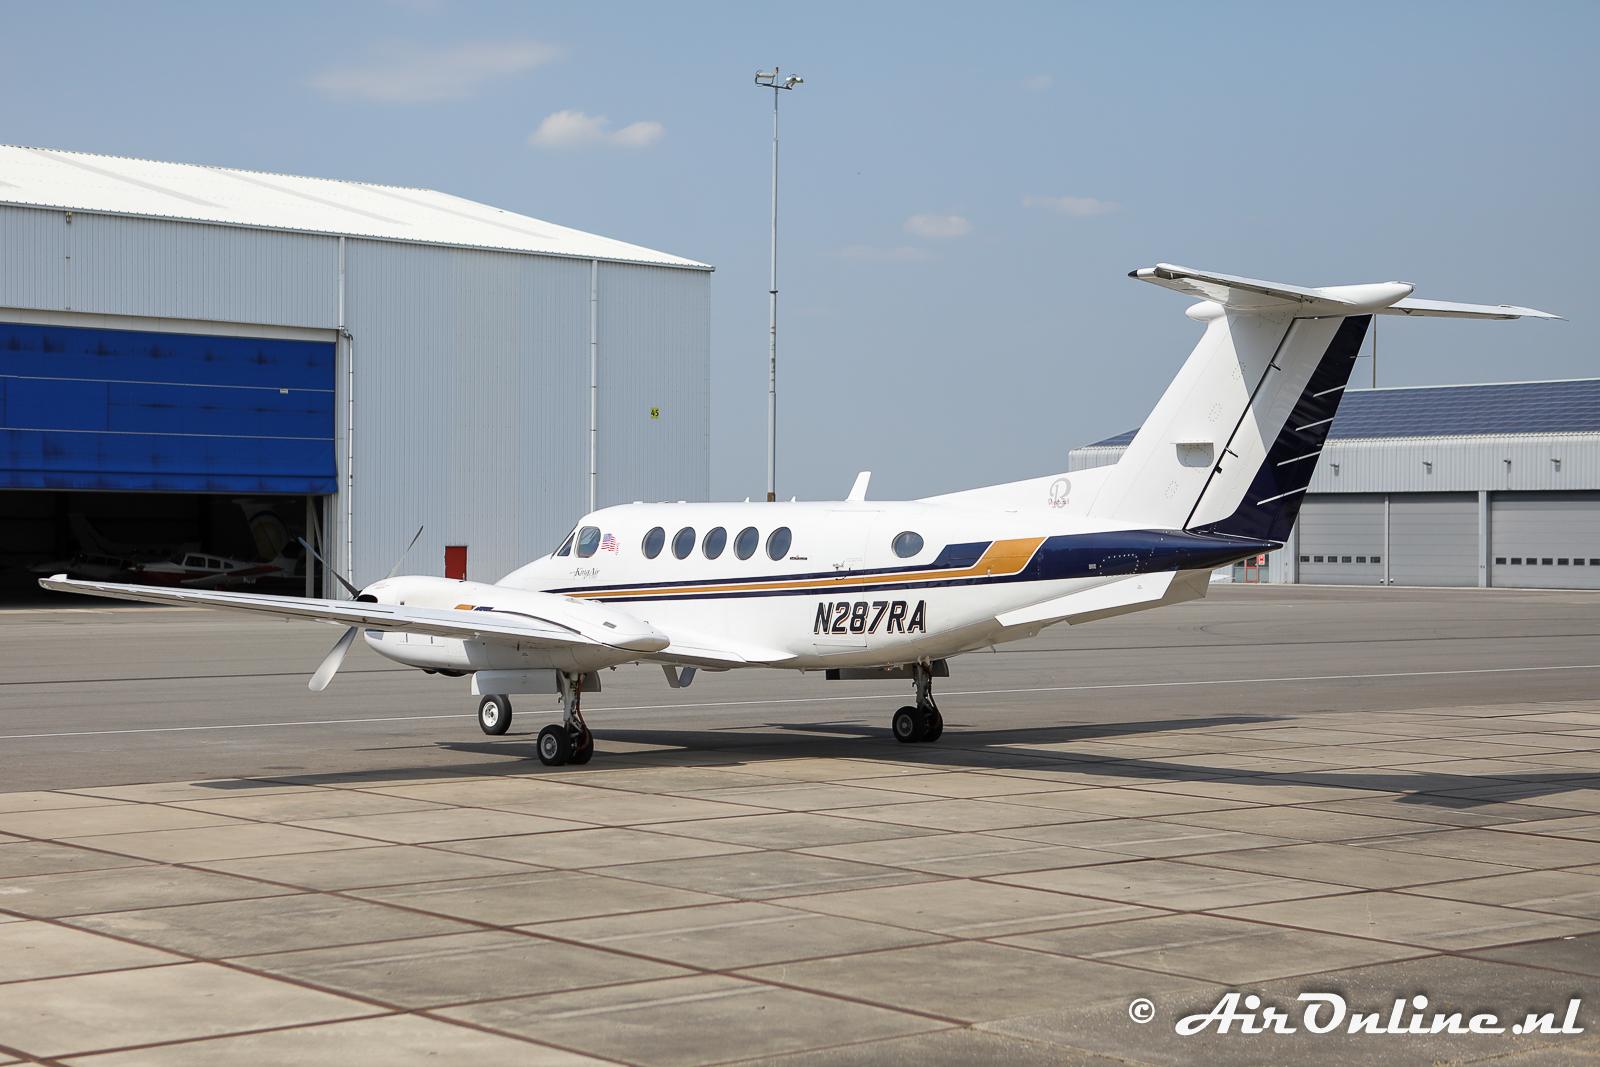 Our 4th Aircraft Beech King Air